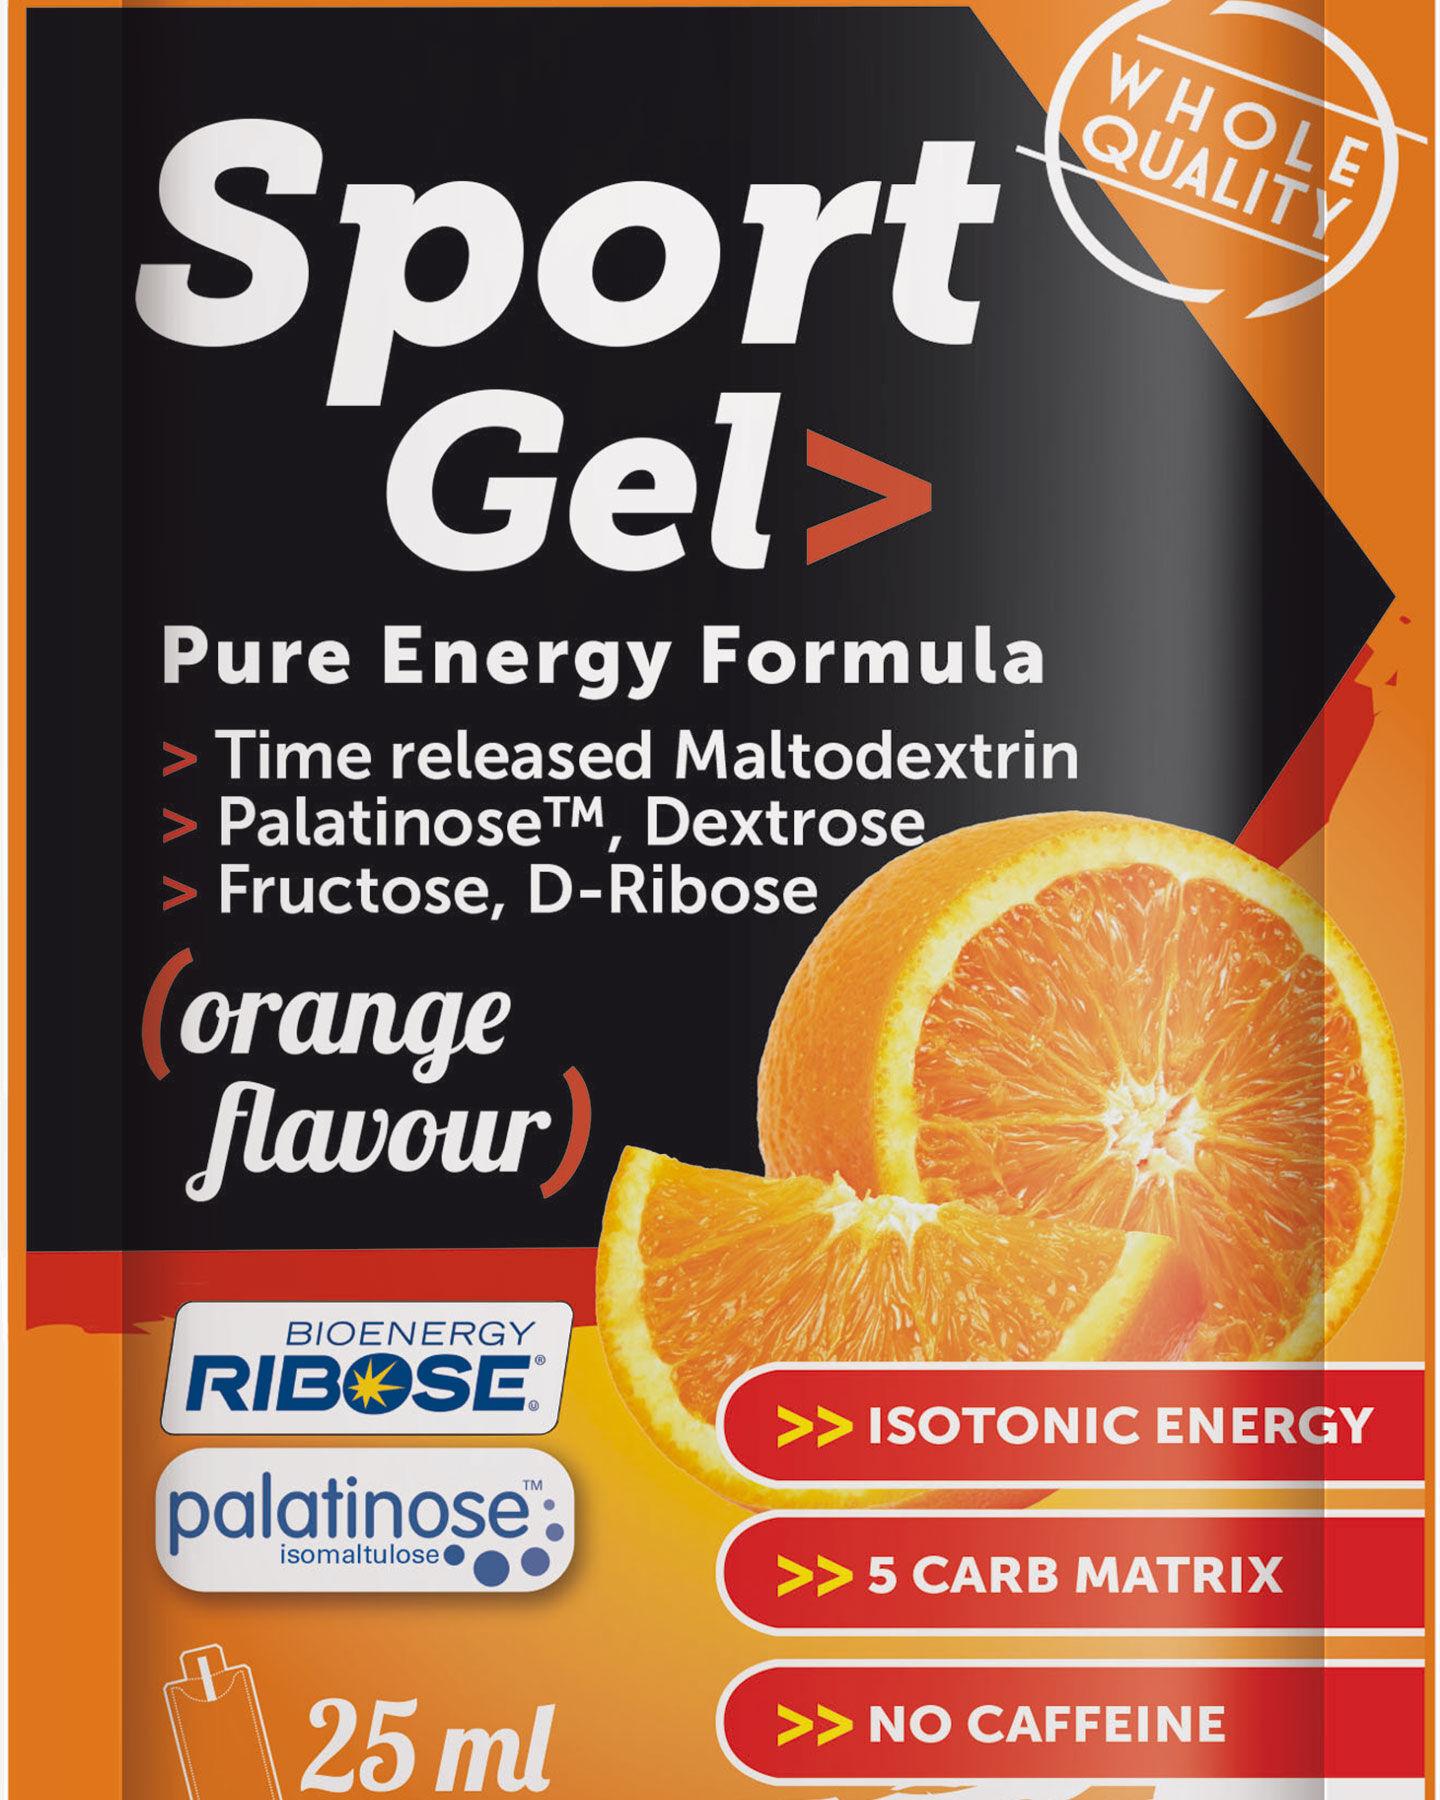 Energetico NAMED SPORT GEL ORANGE FLAVOUR S4028453 scatto 1